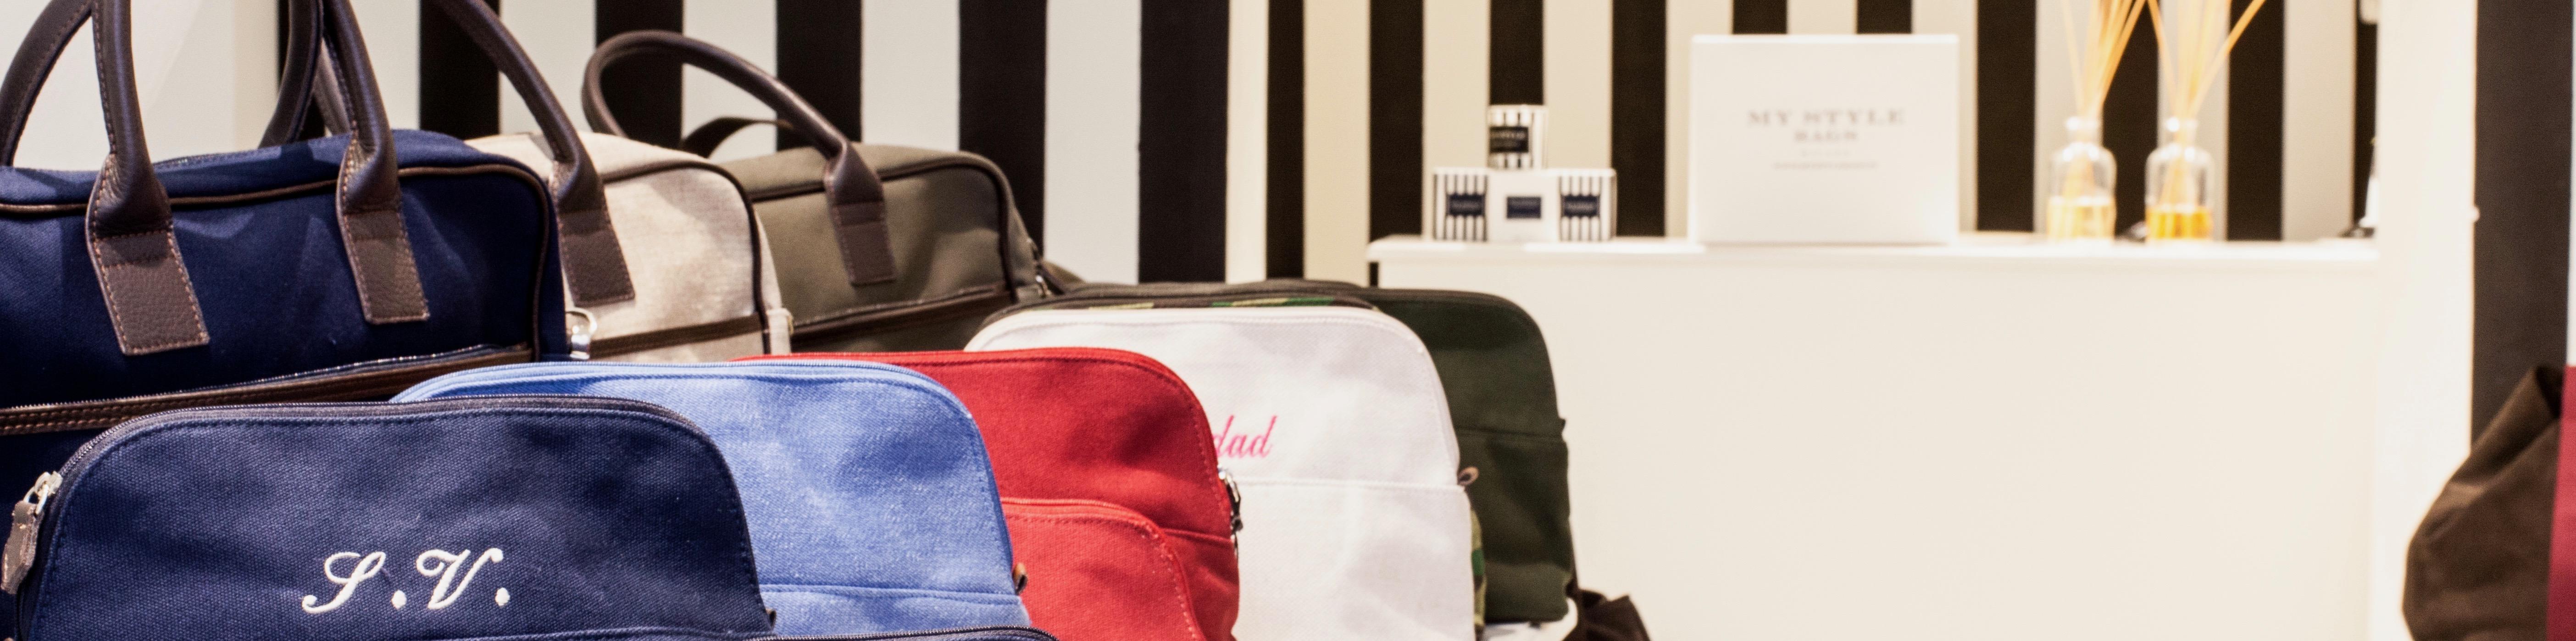 Detalle tienda my style bag 6